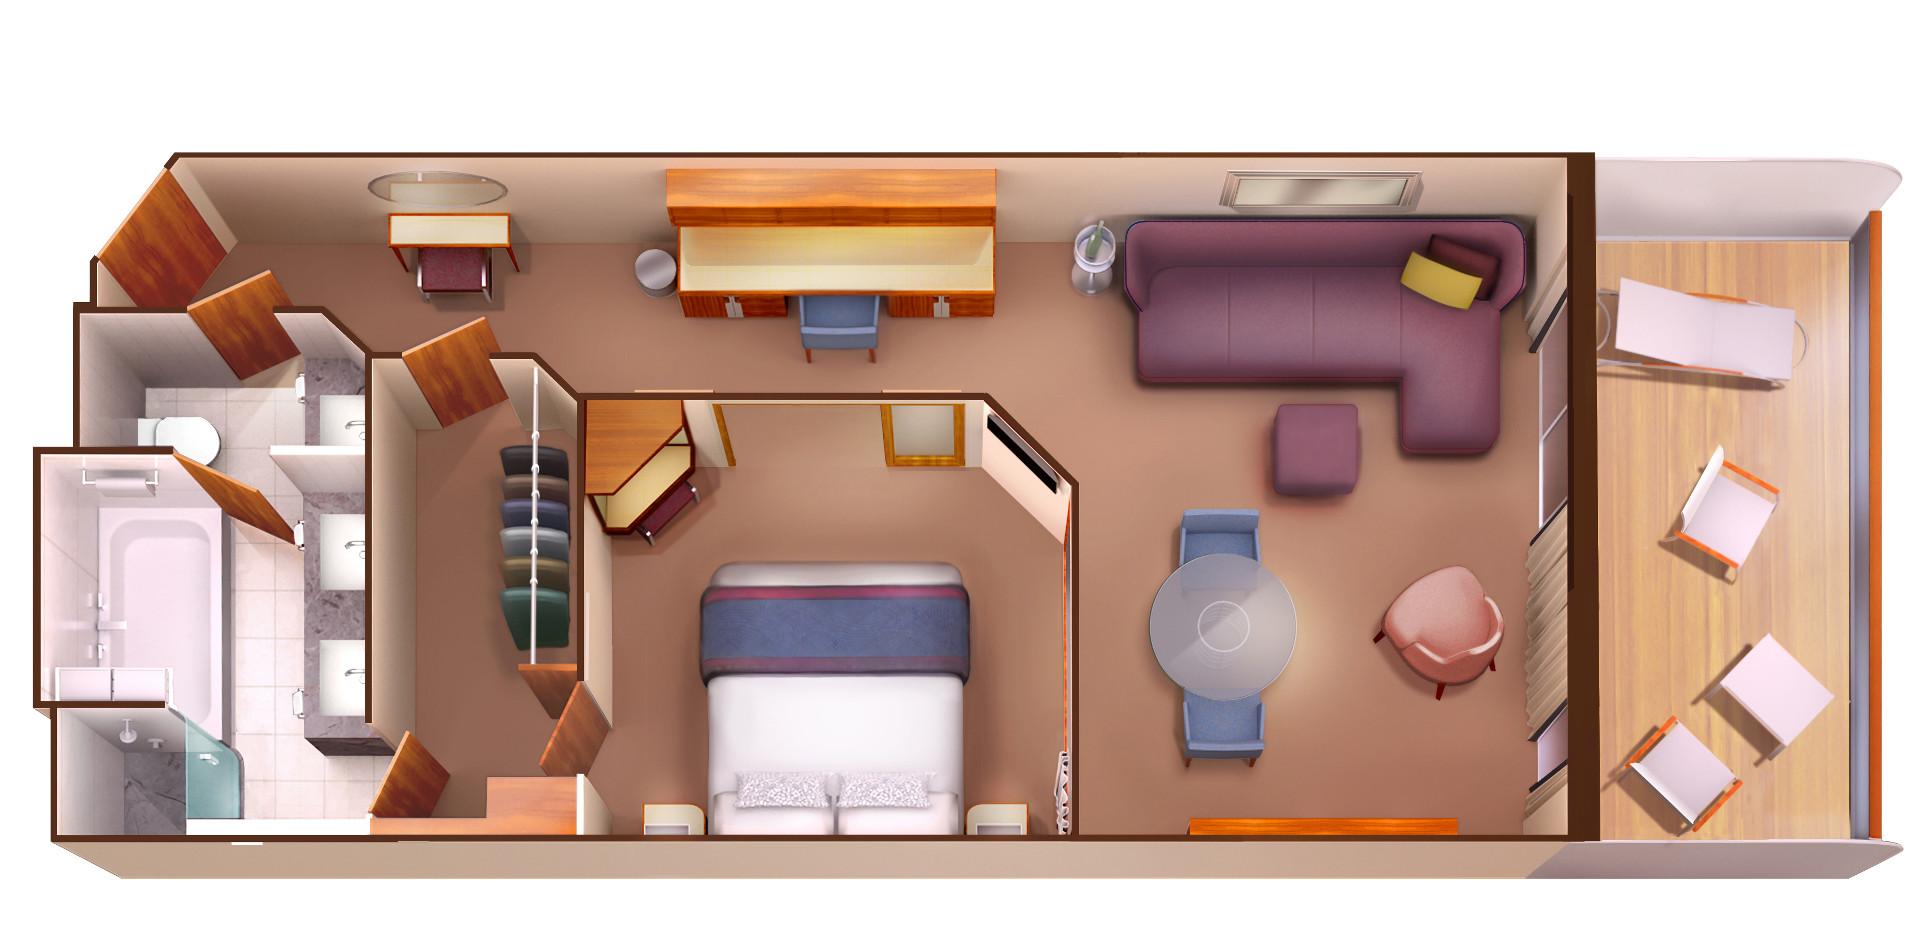 Penthouse Suite - Seabourn Encore - Penthouse Suite PH - Seabourn Encore - Bild 5 - Grundriss Thumb